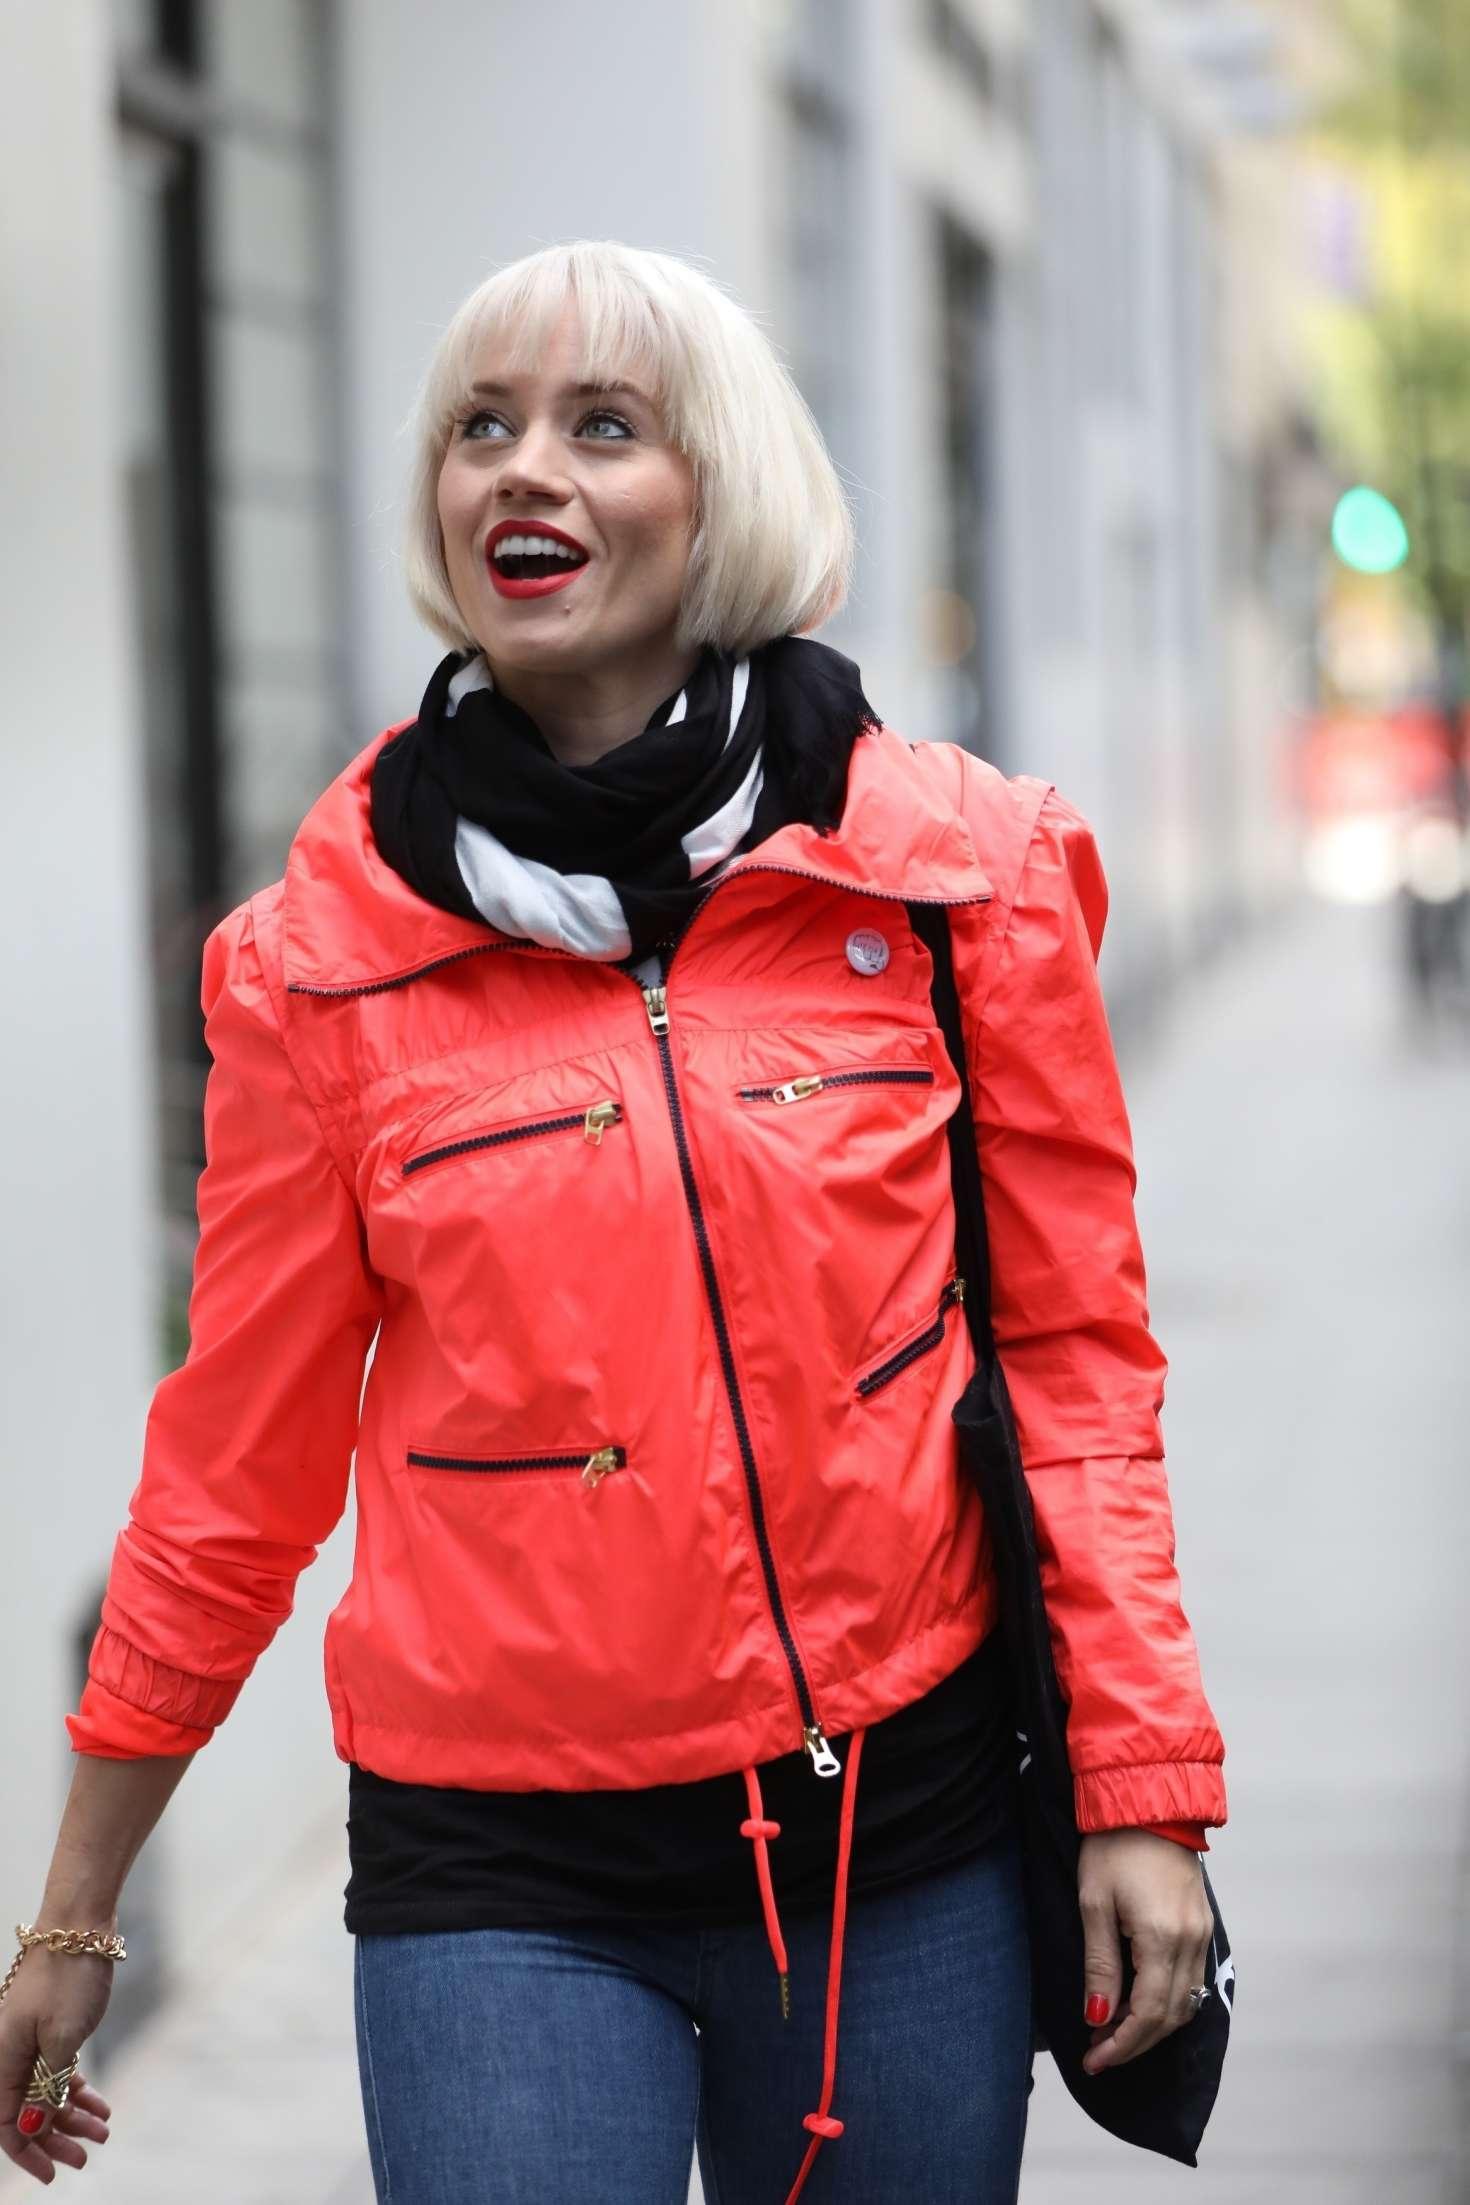 Kimberly Wyatt 2018 : Kimberly Wyatt in Red Jacket -08